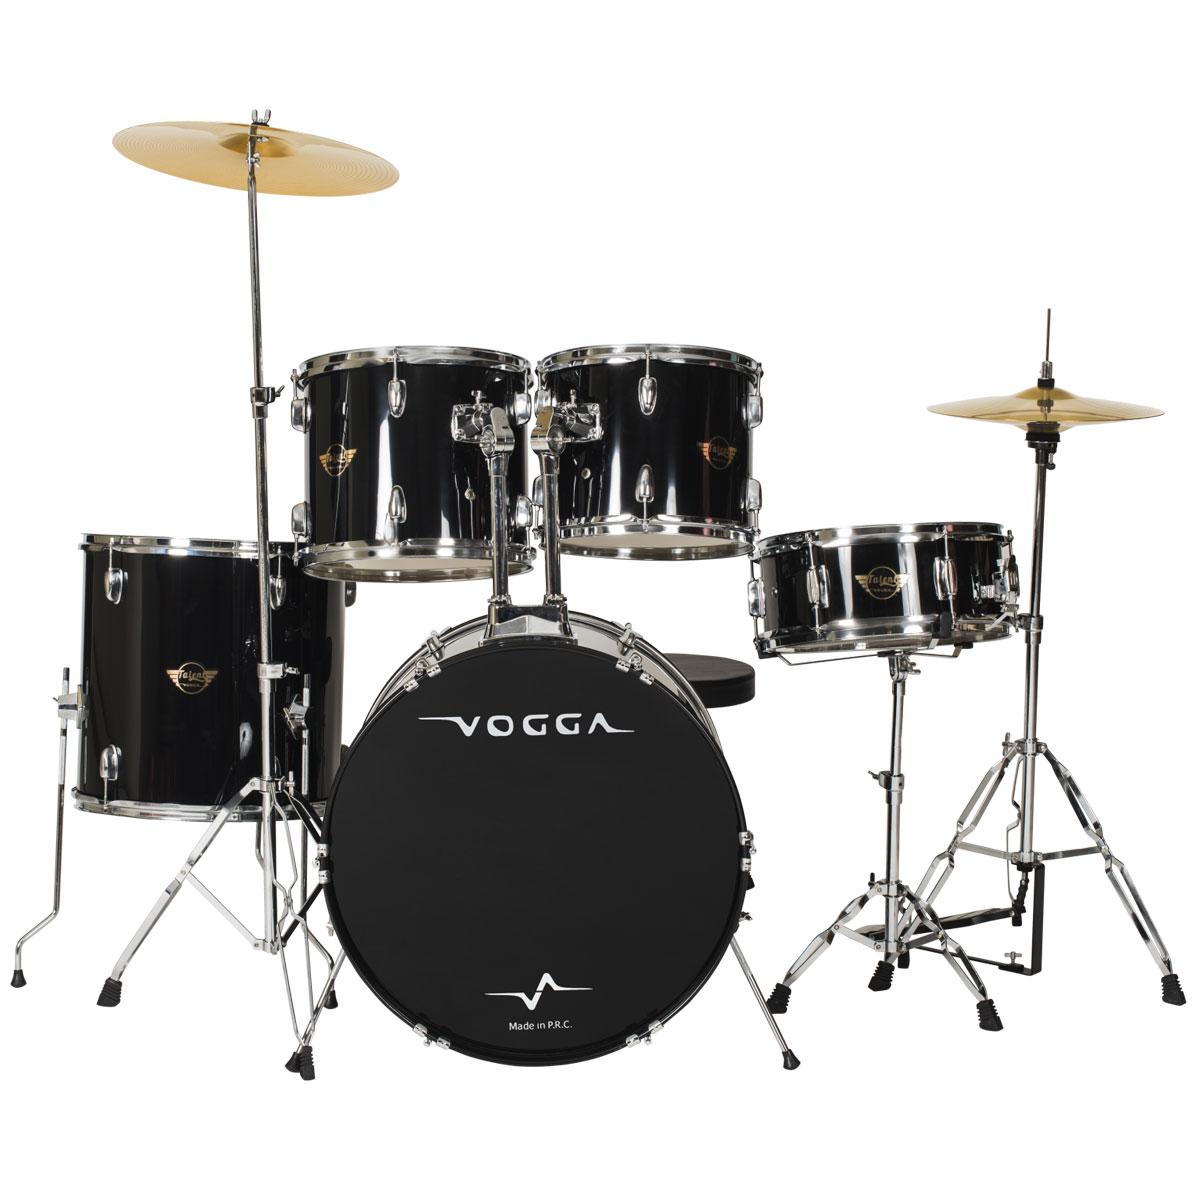 Bateria Acústica Bumbo 20 Polegadas Talent VPD920 Preta - Vogga